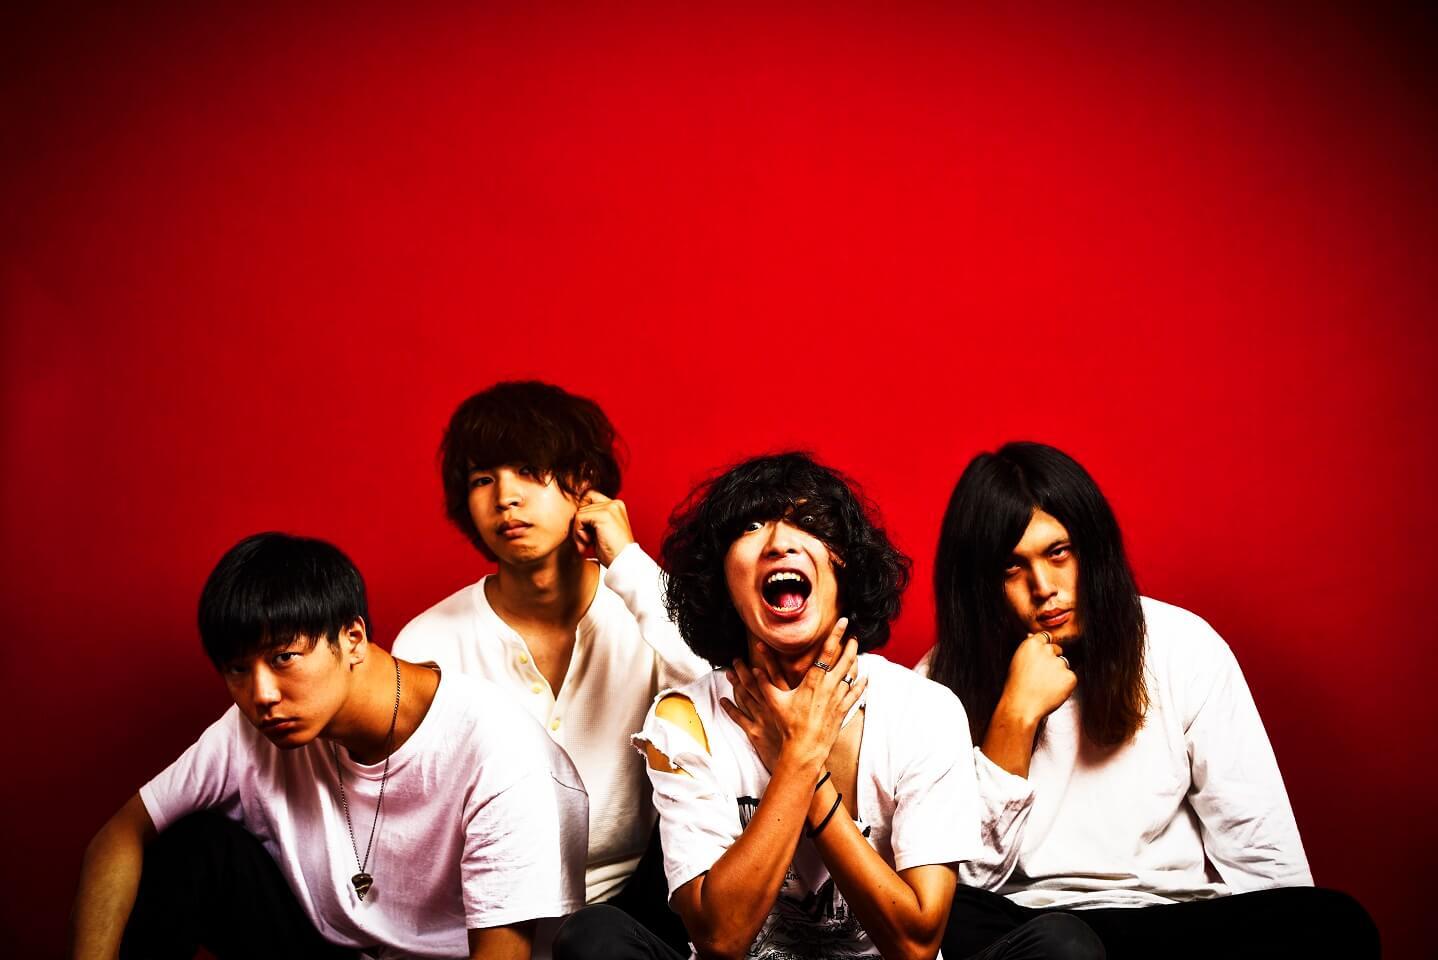 WOMCADOLE、2nd Single「ライター」MV公開!ツアーゲストバンド第1弾にircle、mol-74、KAKASHI、GOOD ON THE REELらサムネイル画像